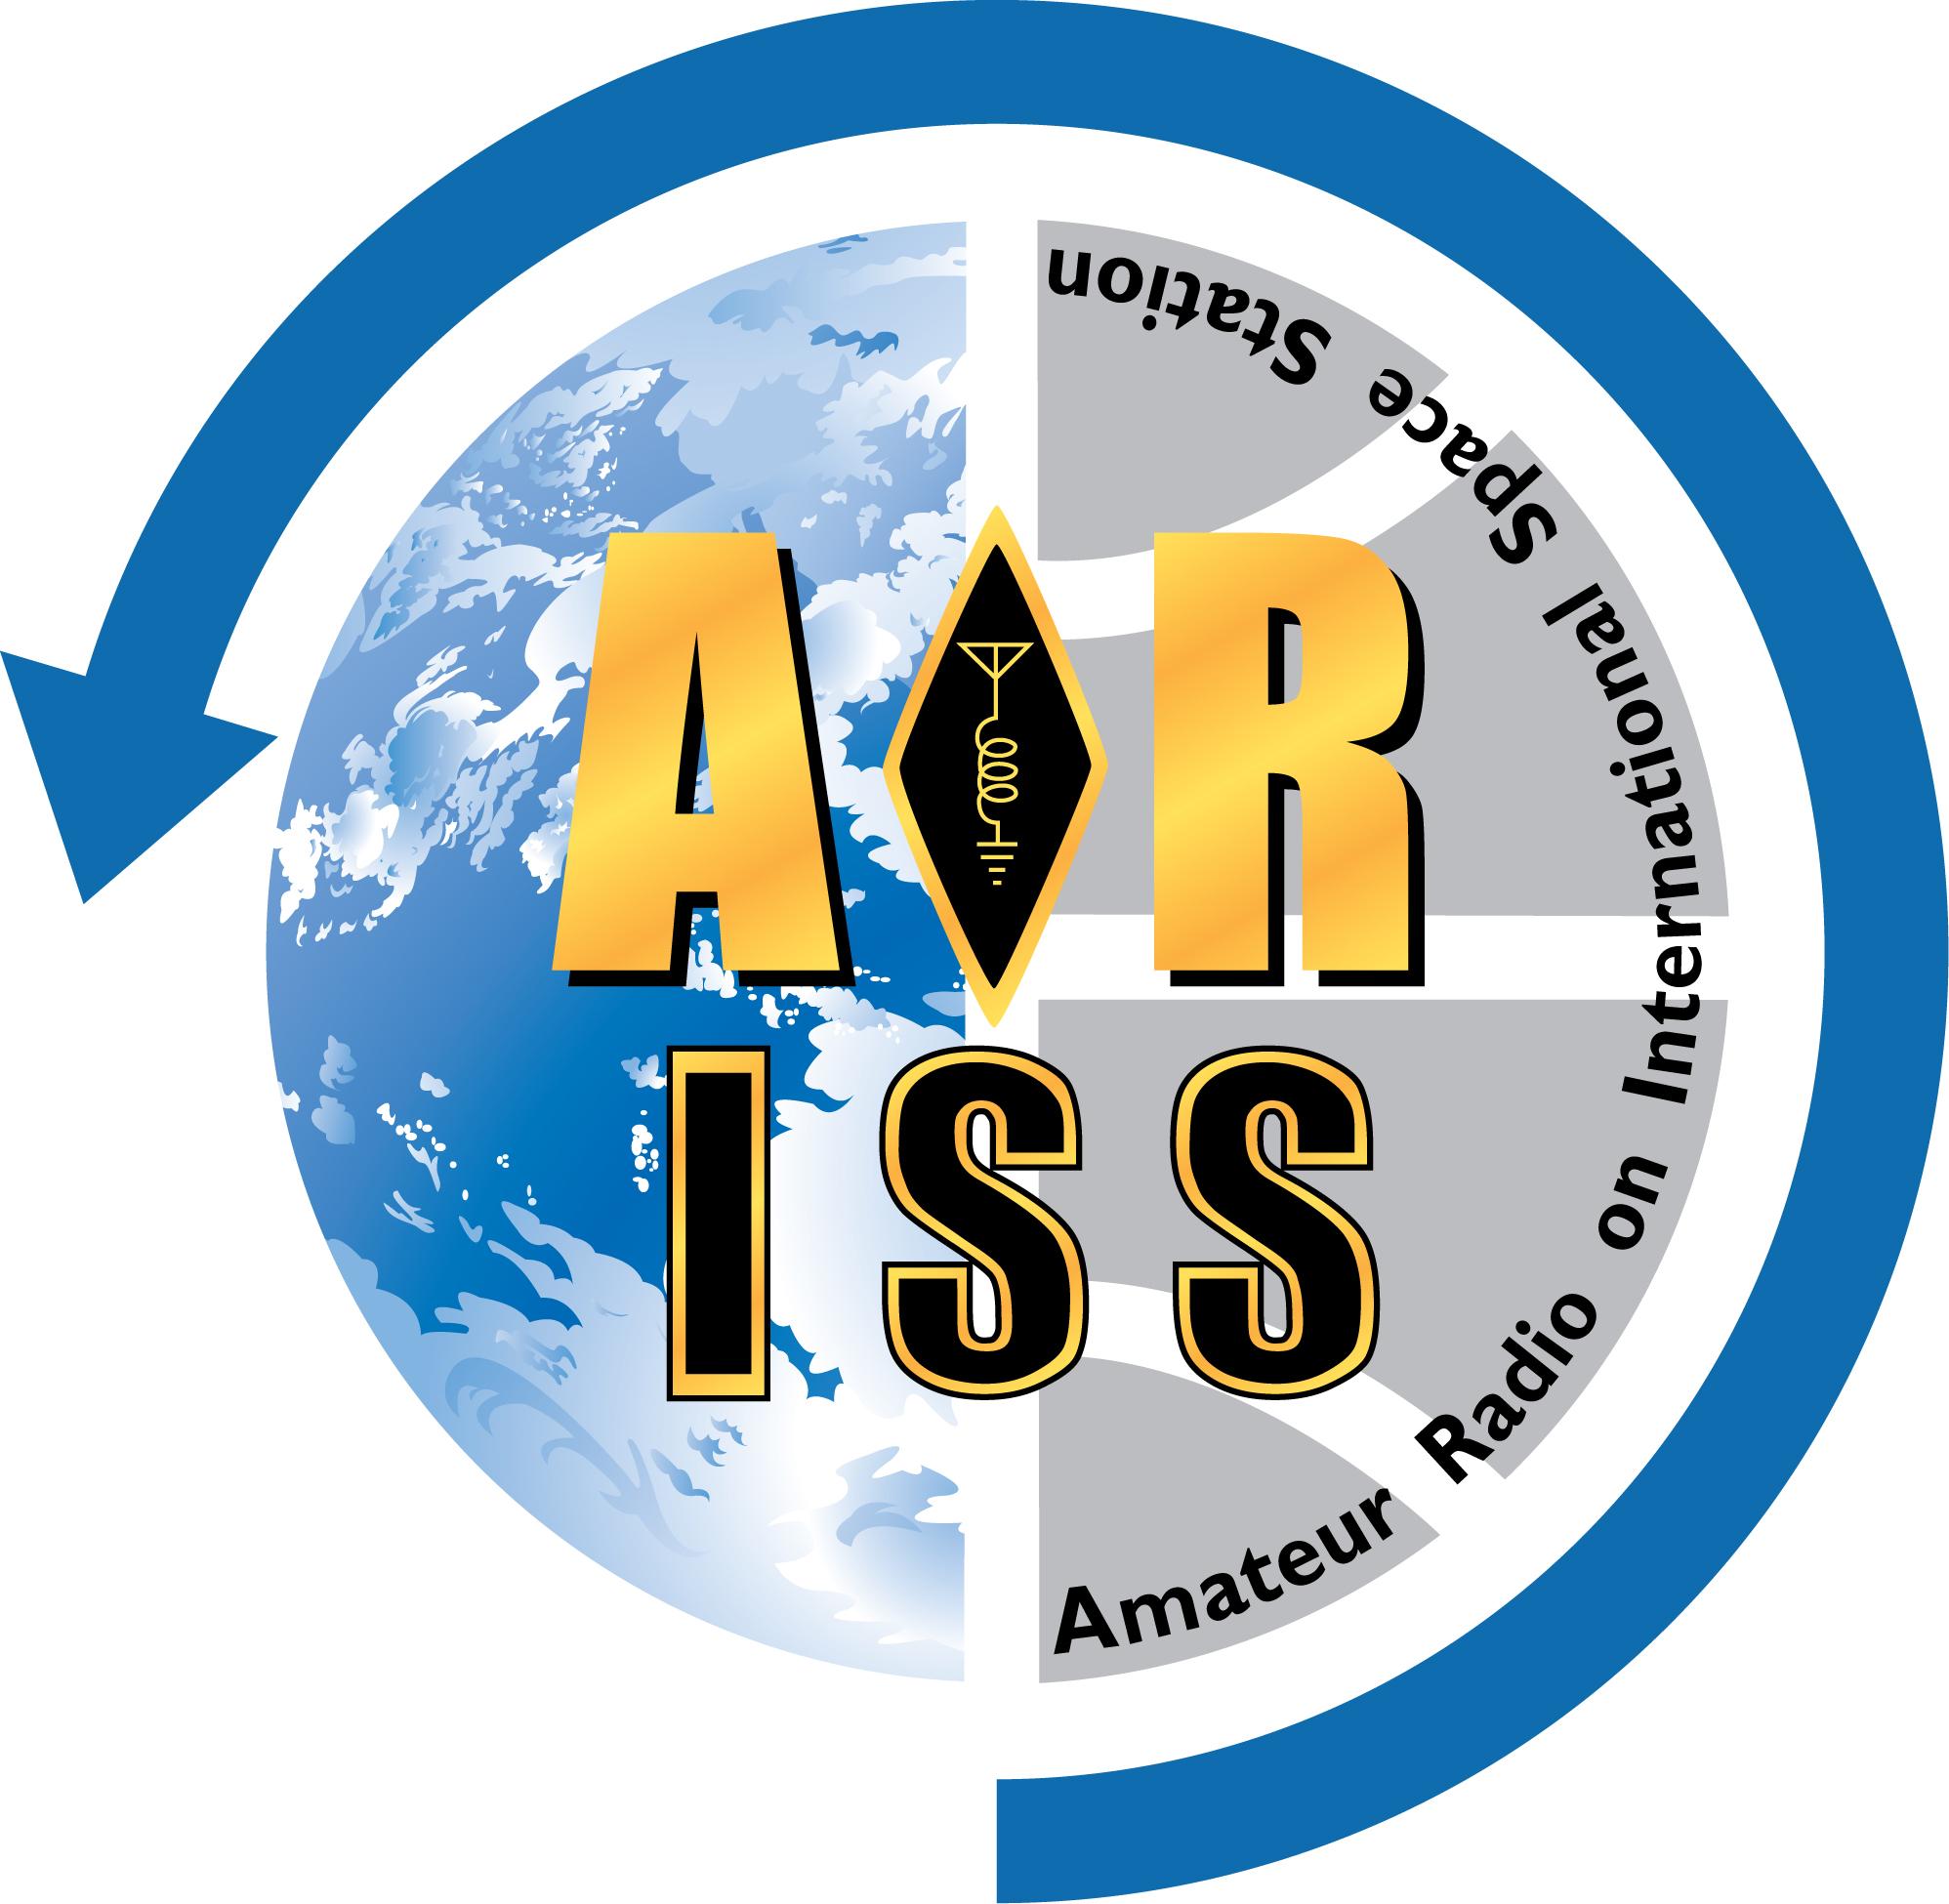 ariss-radioamateur-iss